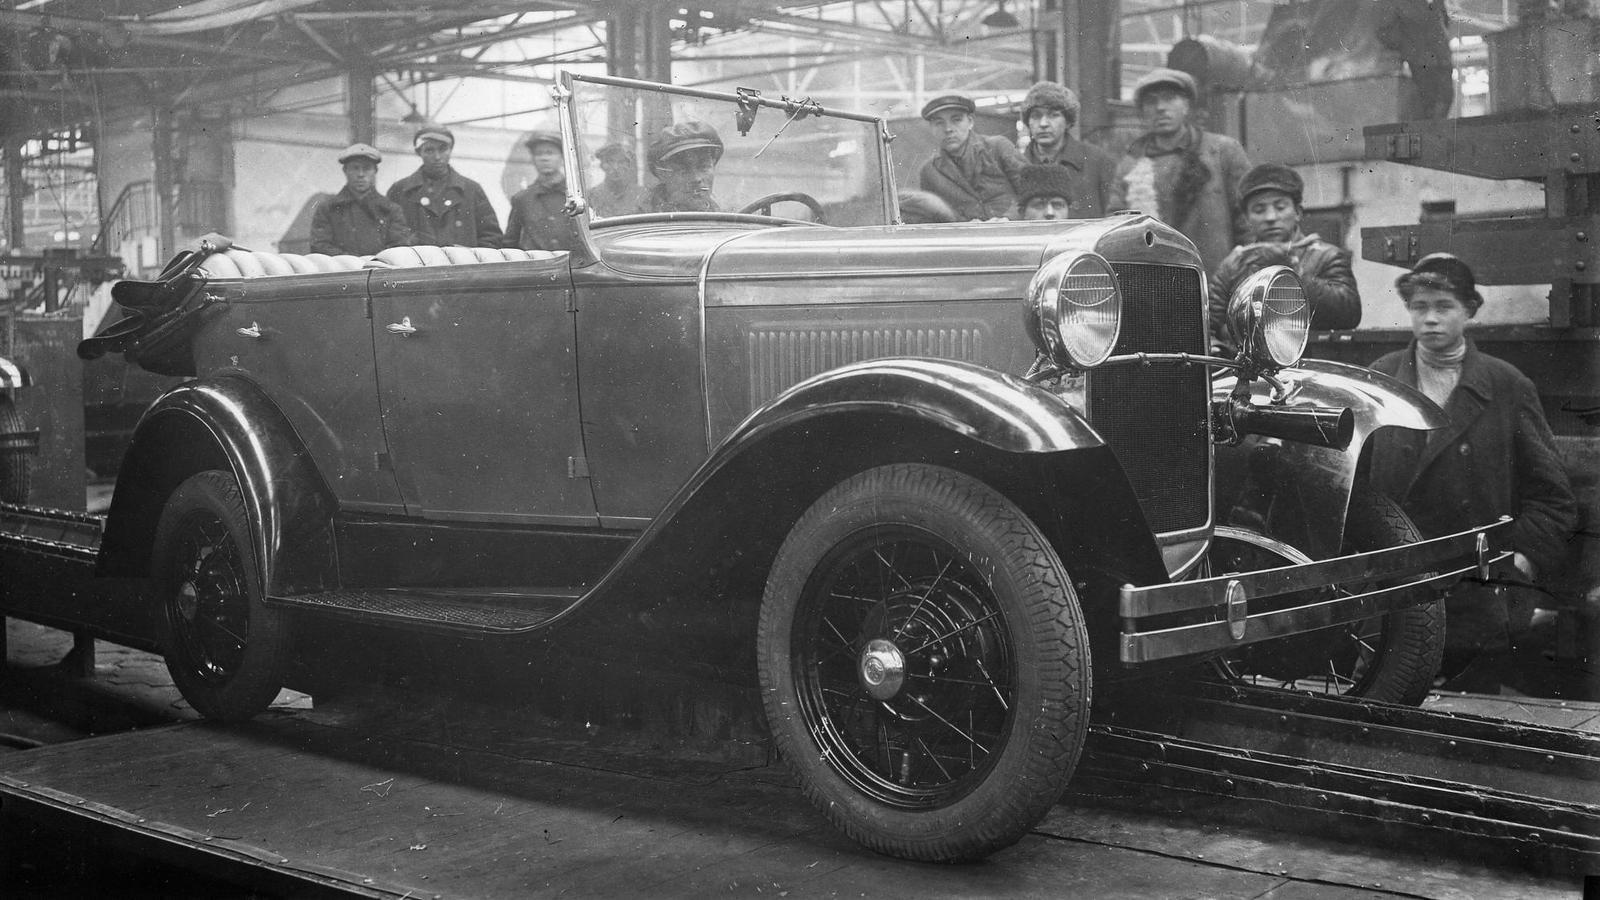 Пятая машина первого выпуска ГАЗ-А. 06.12.1932 г